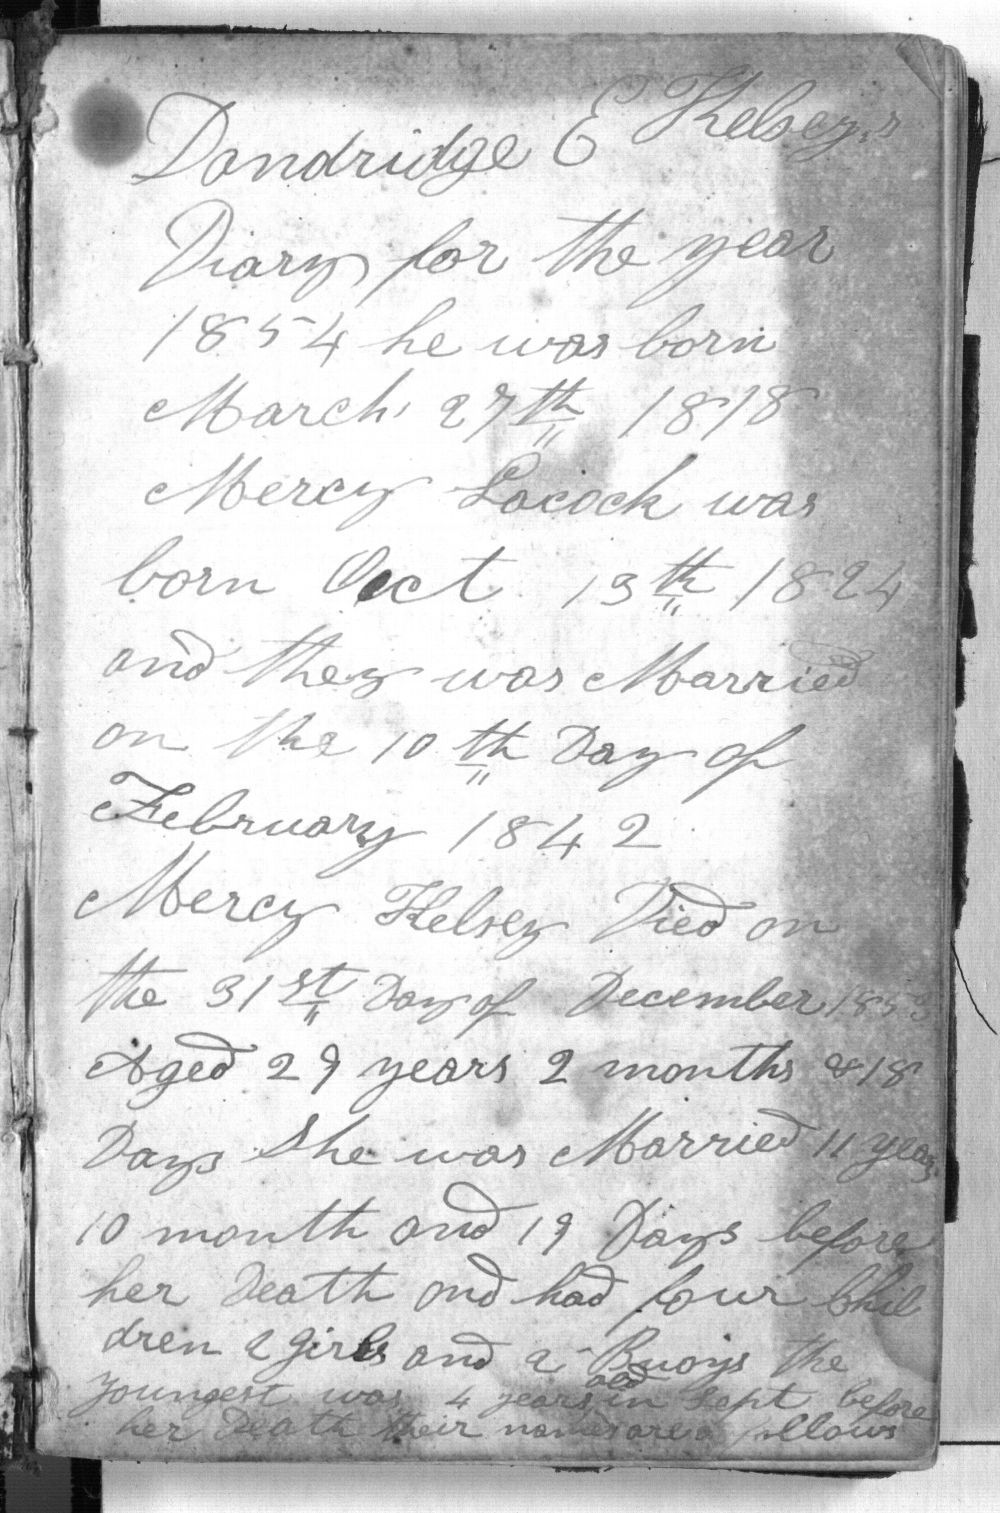 Dandridge E. Kelsey's 1854 diary - i